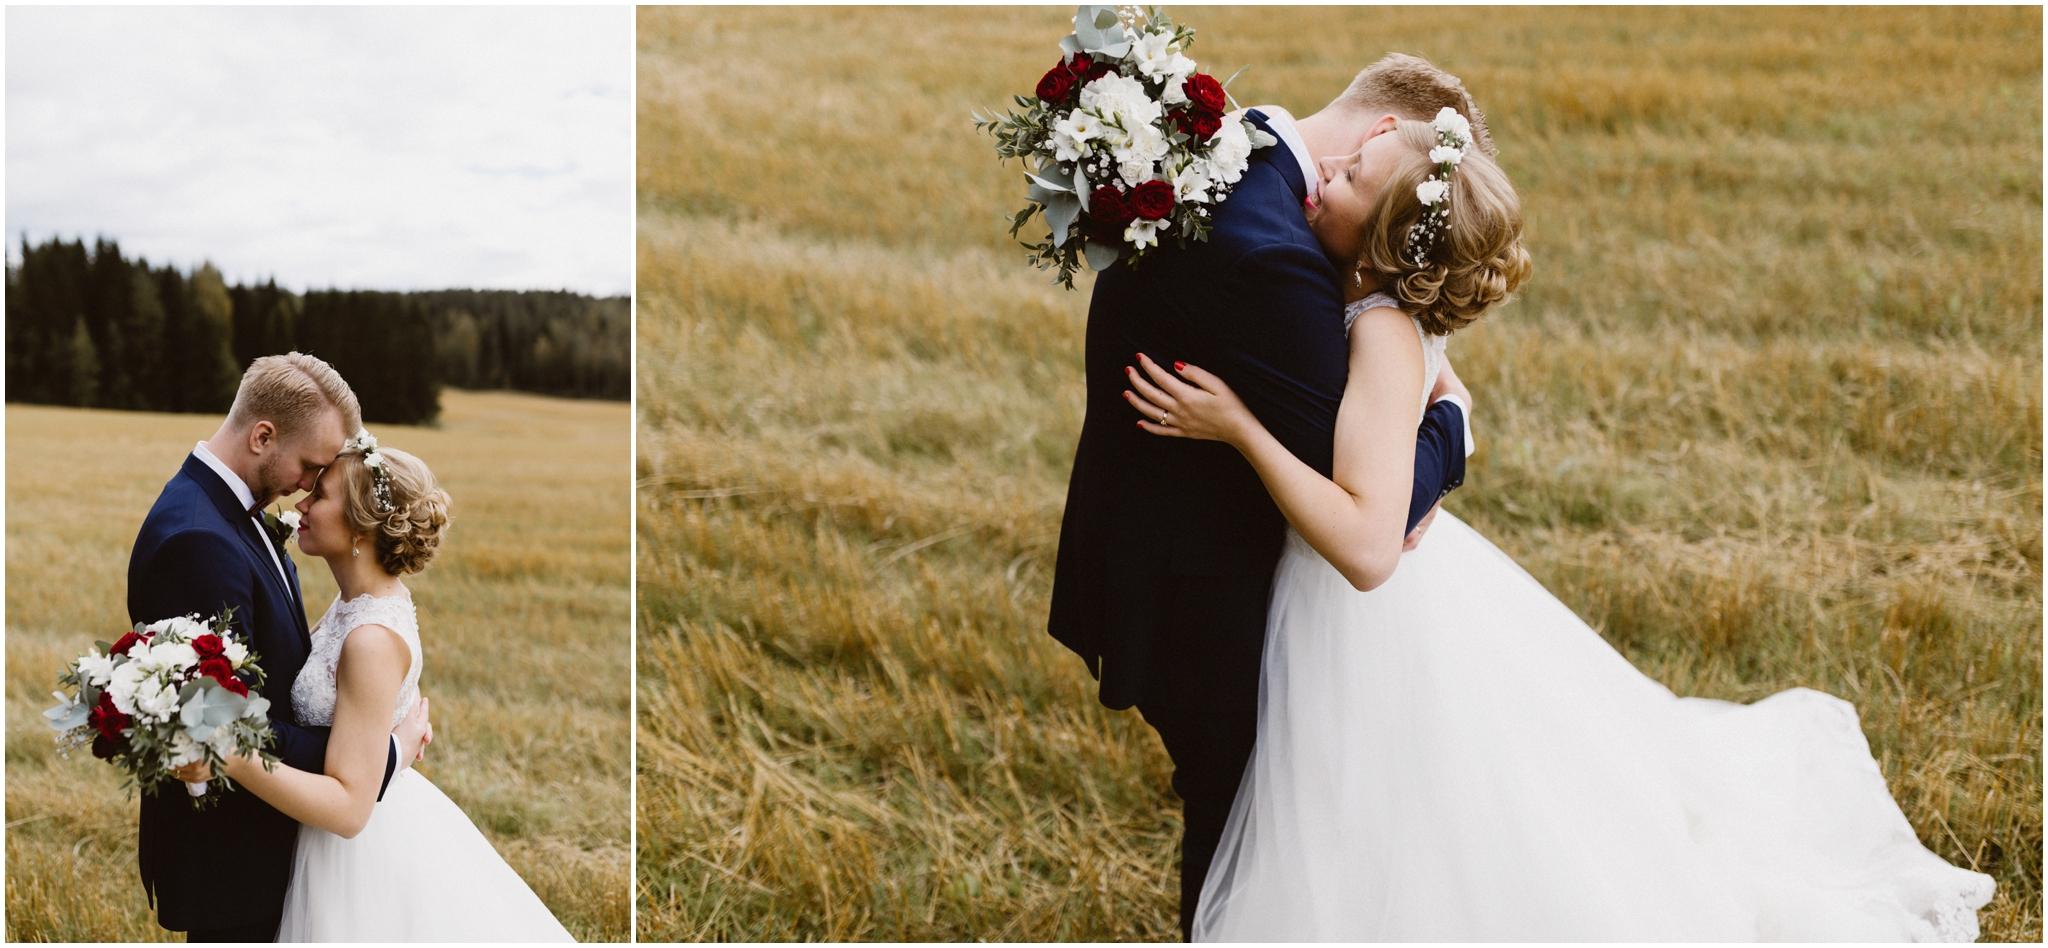 Leevi + Susanna -- Patrick Karkkolainen Wedding Photographer + Adventurer-127.jpg